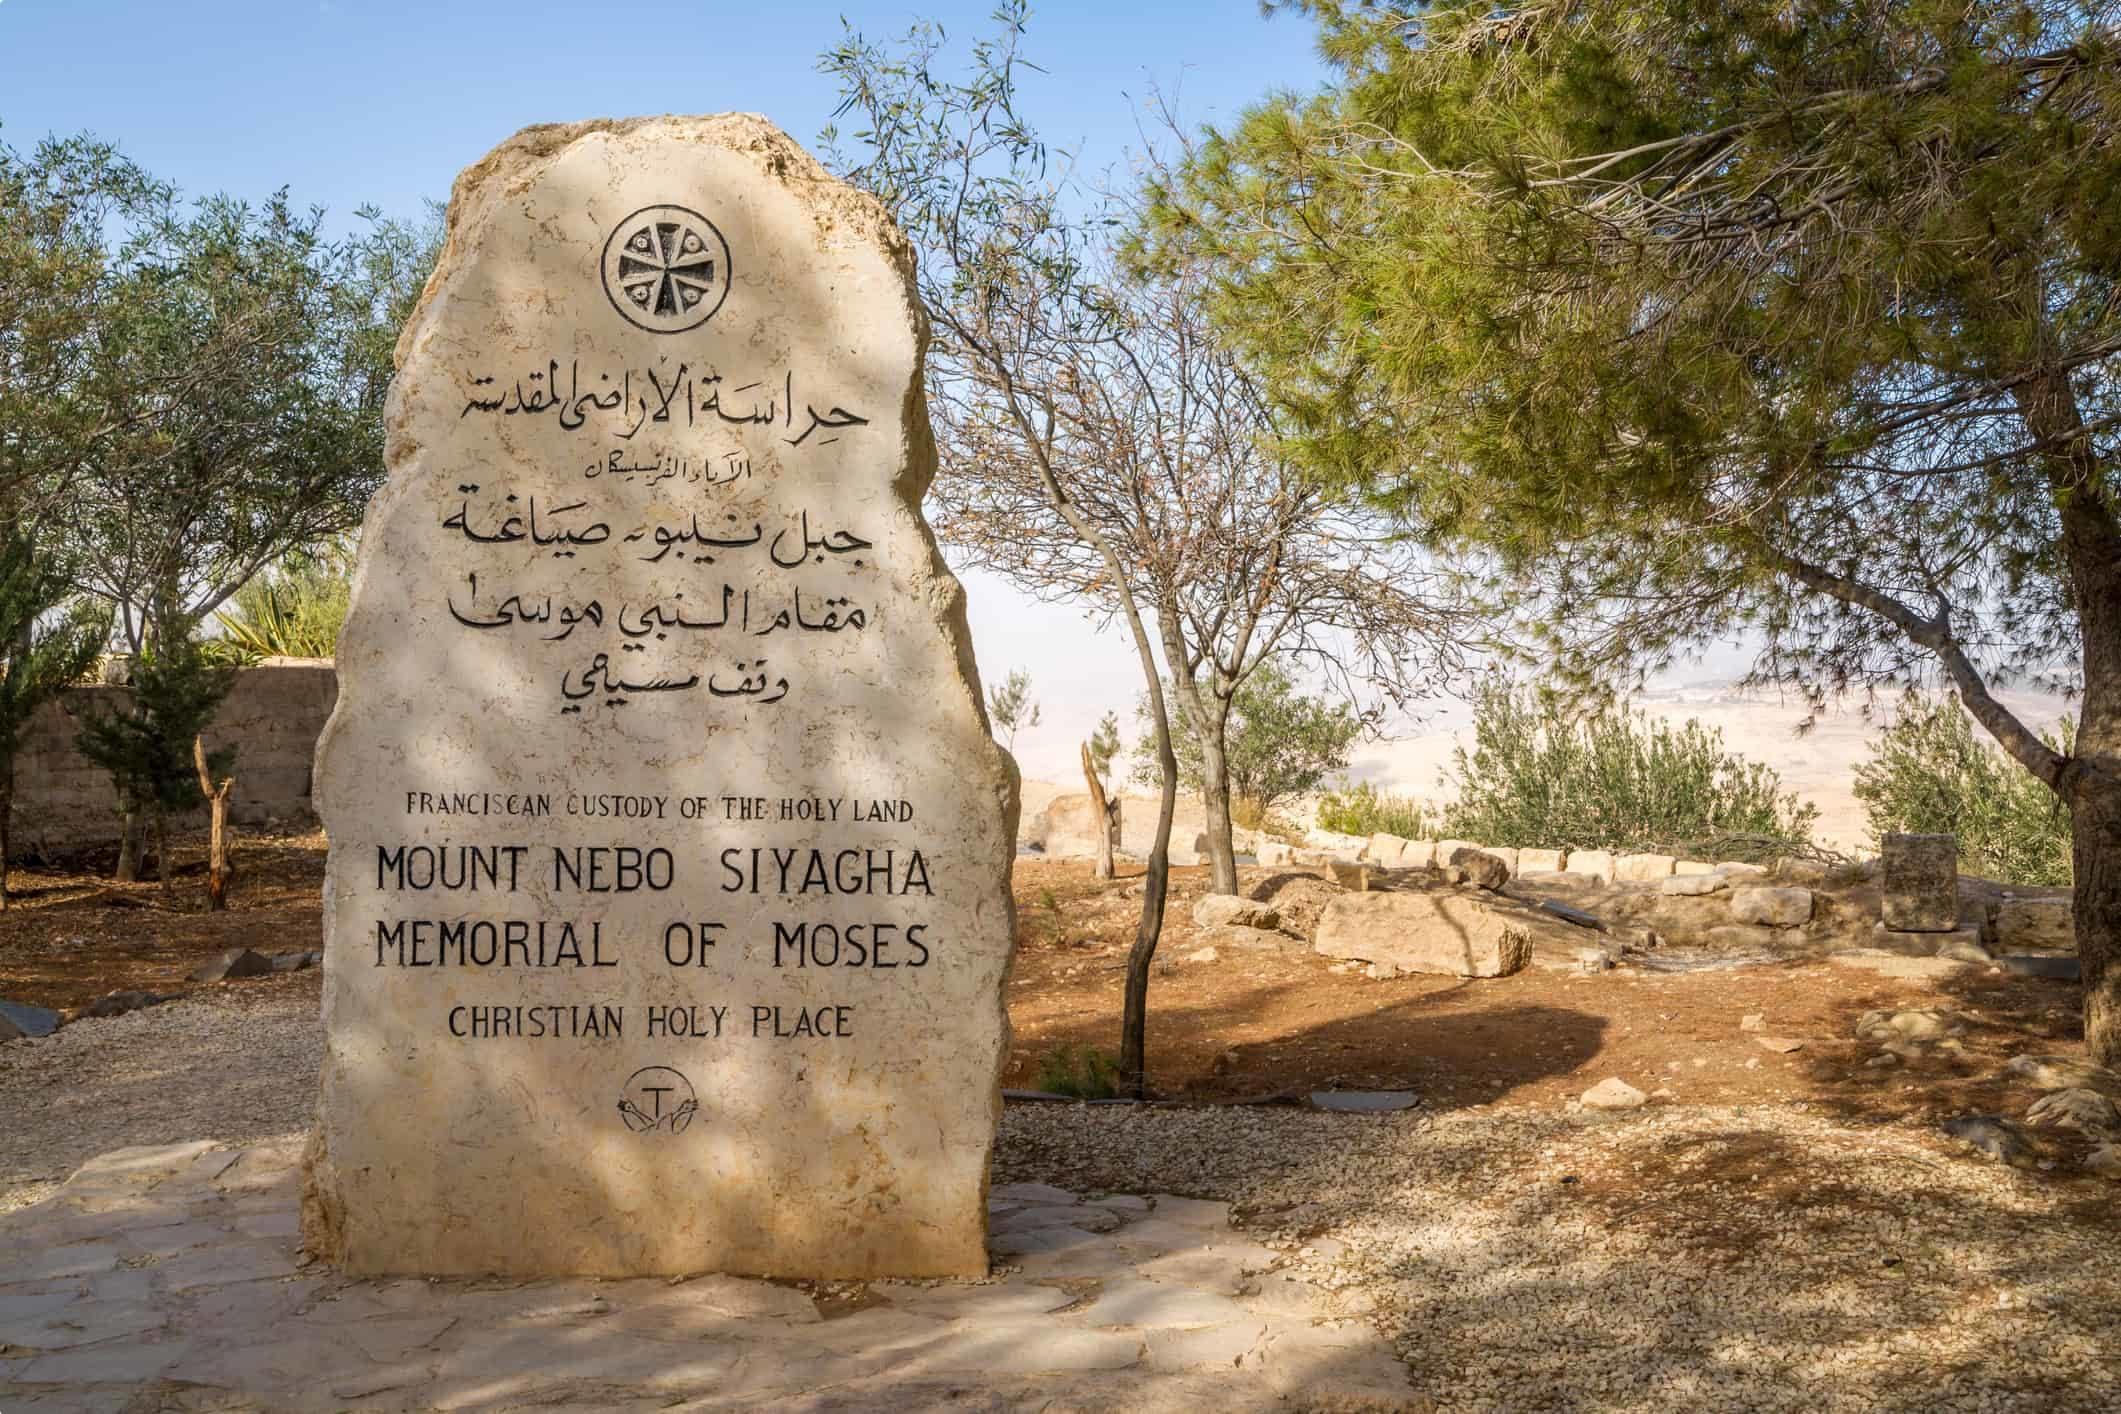 Moses Memorial at Mt. Nebo